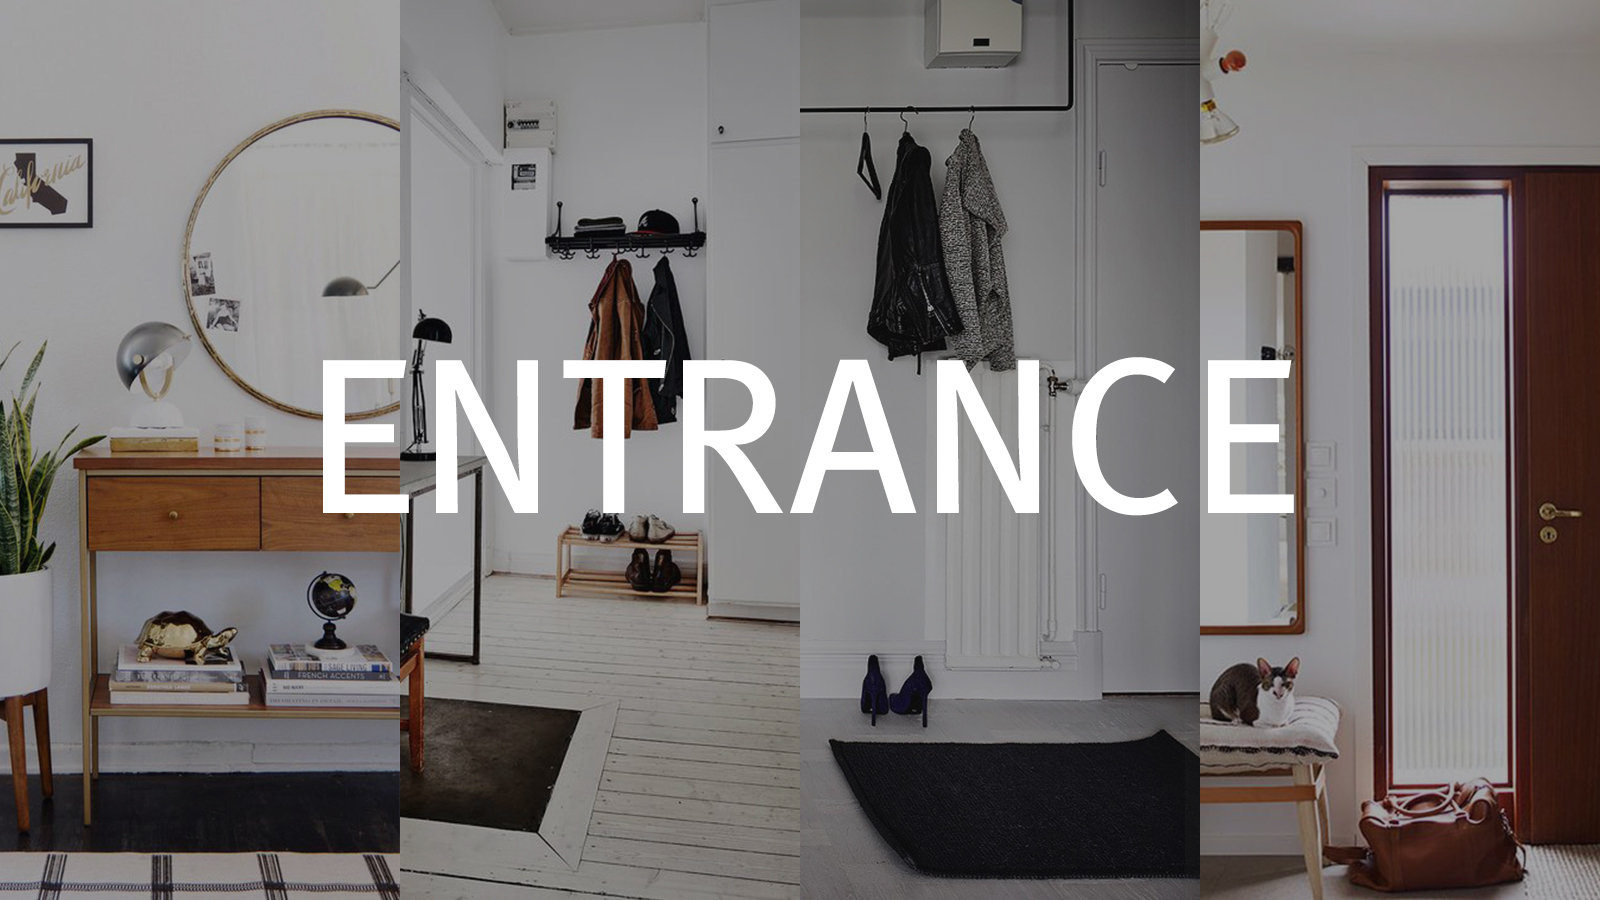 Details per Space - Entrance.jpg